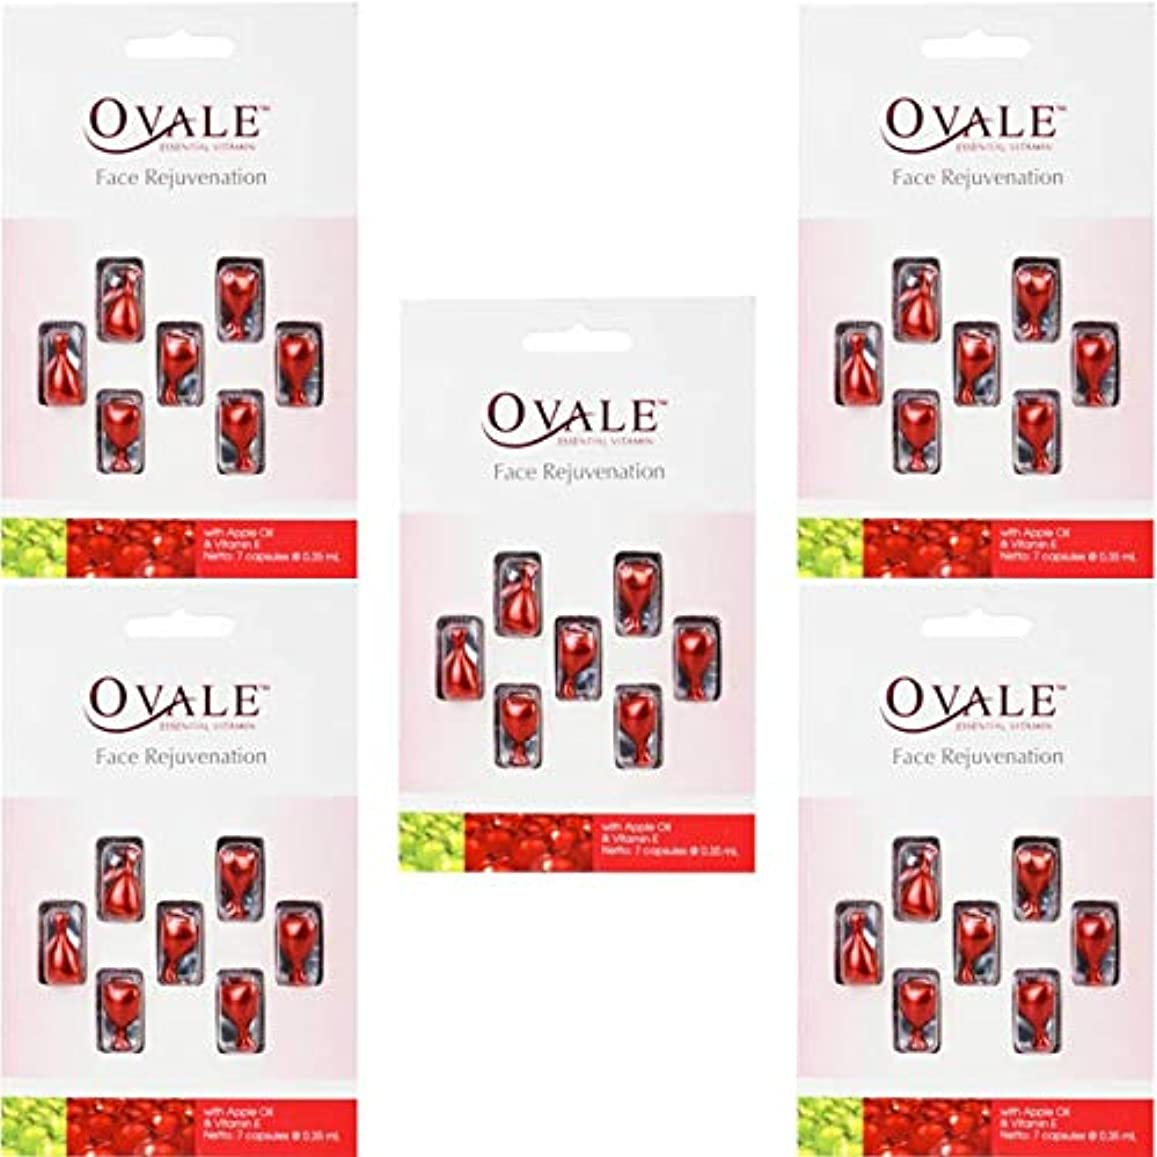 Ovale オーバル フェイシャル美容液 essential vitamin エッセンシャルビタミン 7粒入シート×5枚セット アップル [海外直送品]